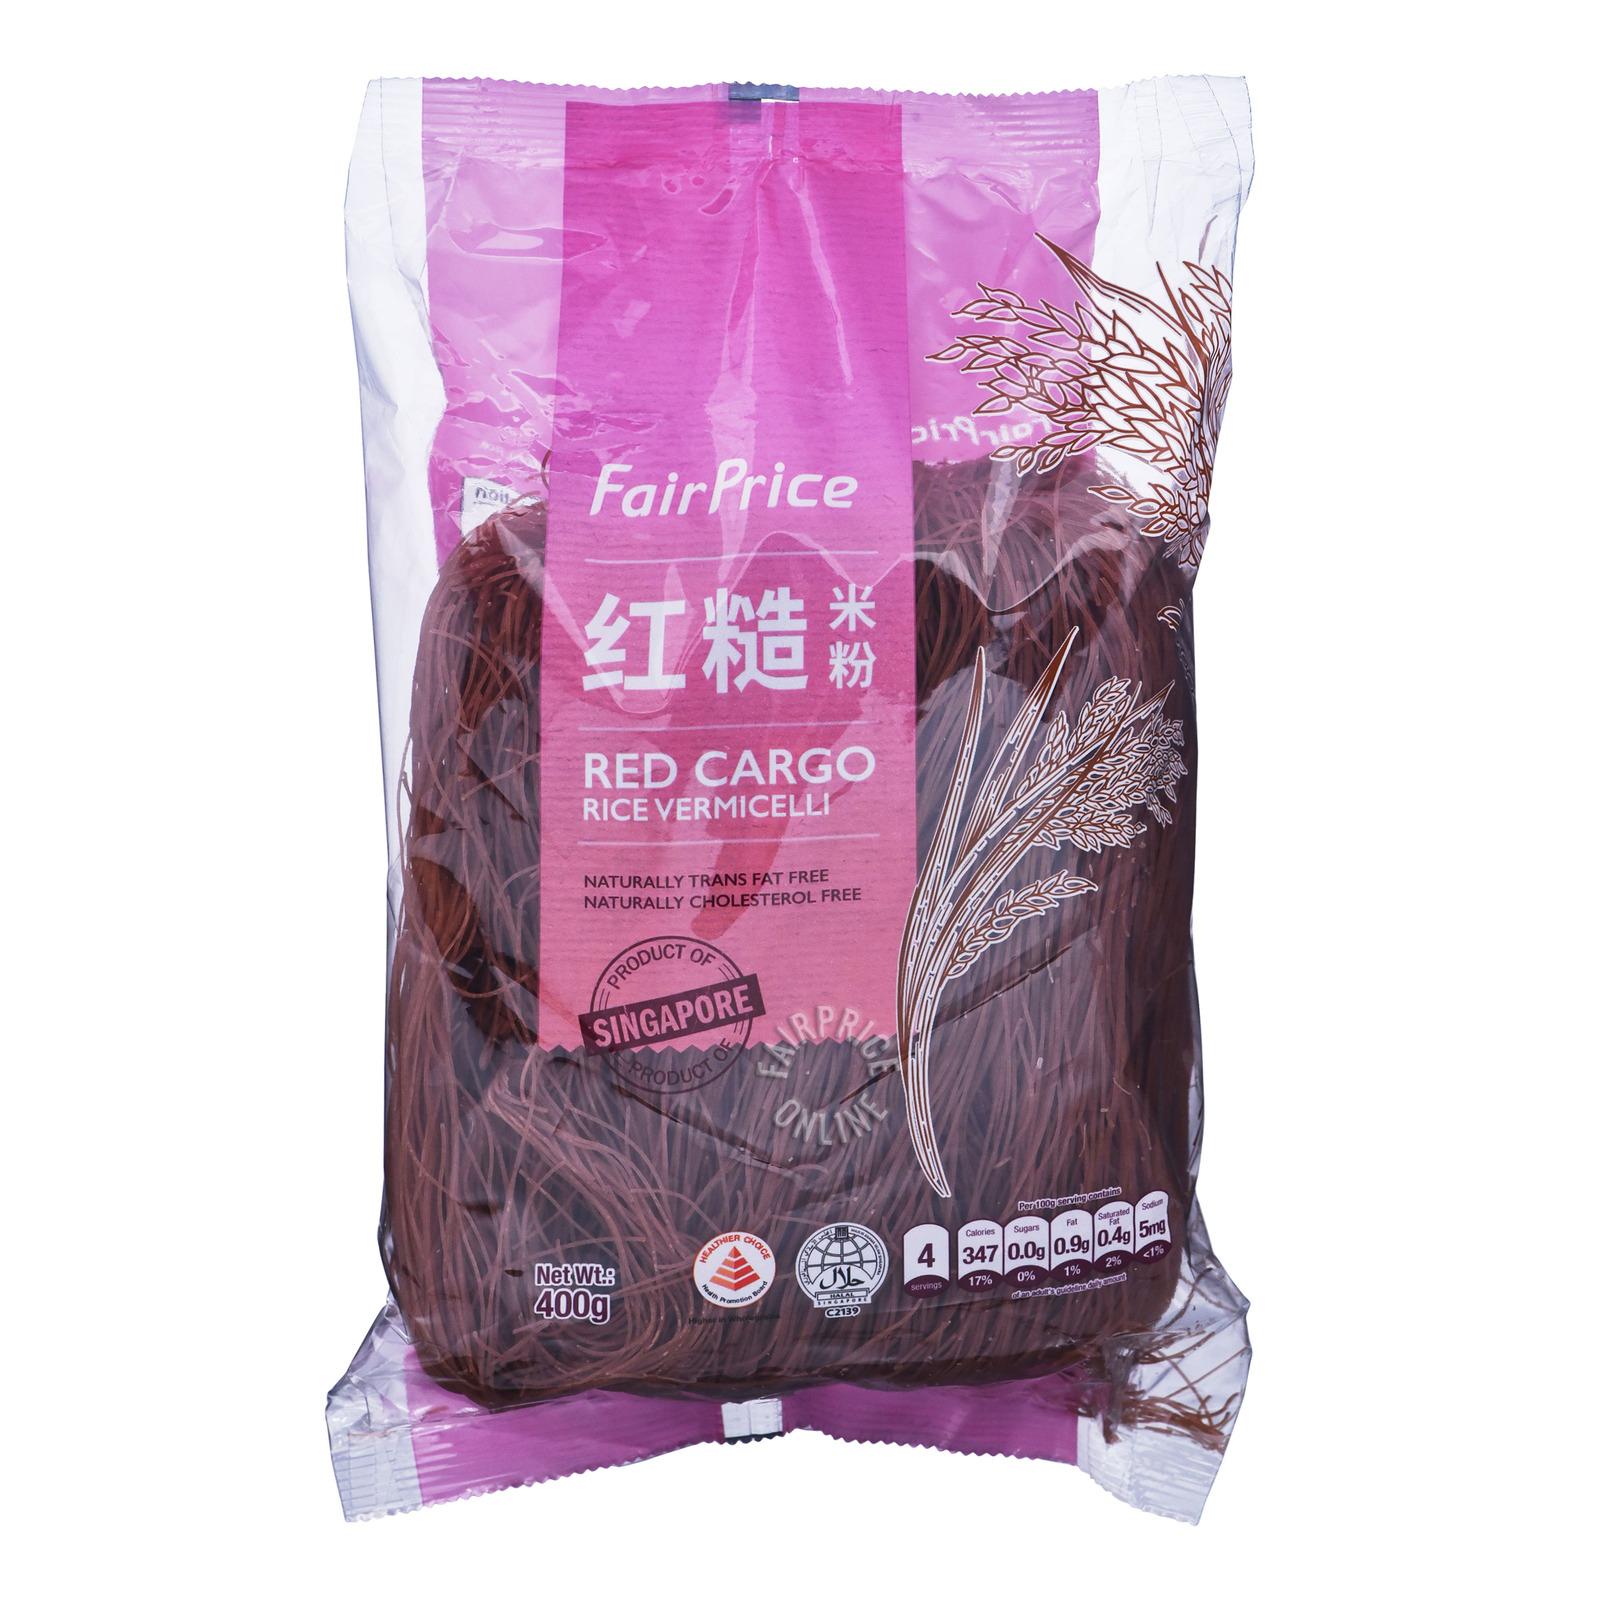 FairPrice Rice Vermicelli - Red Cargo